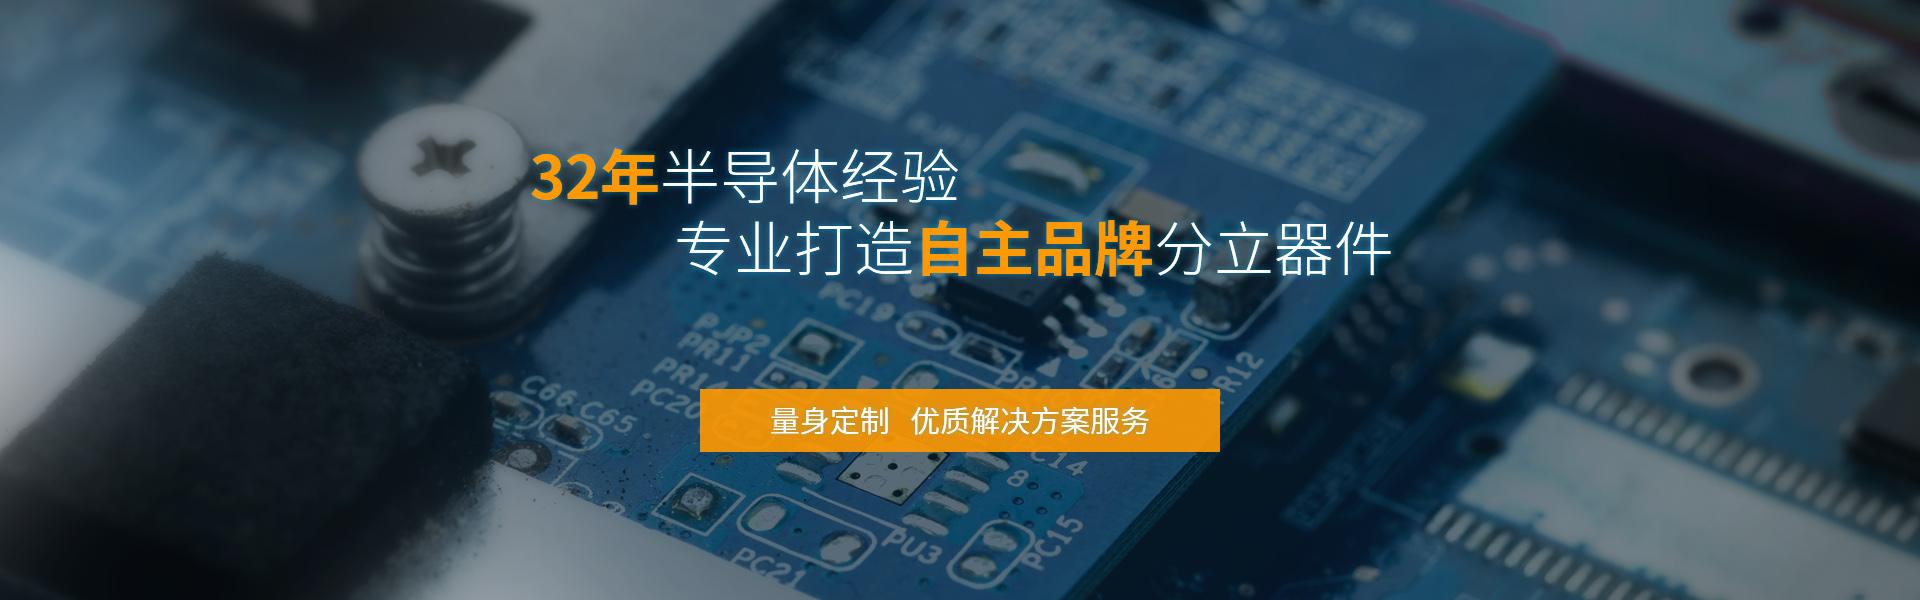 竞cai网zhan微电子32年竞cai网zhanjing验,专业制造mosguan